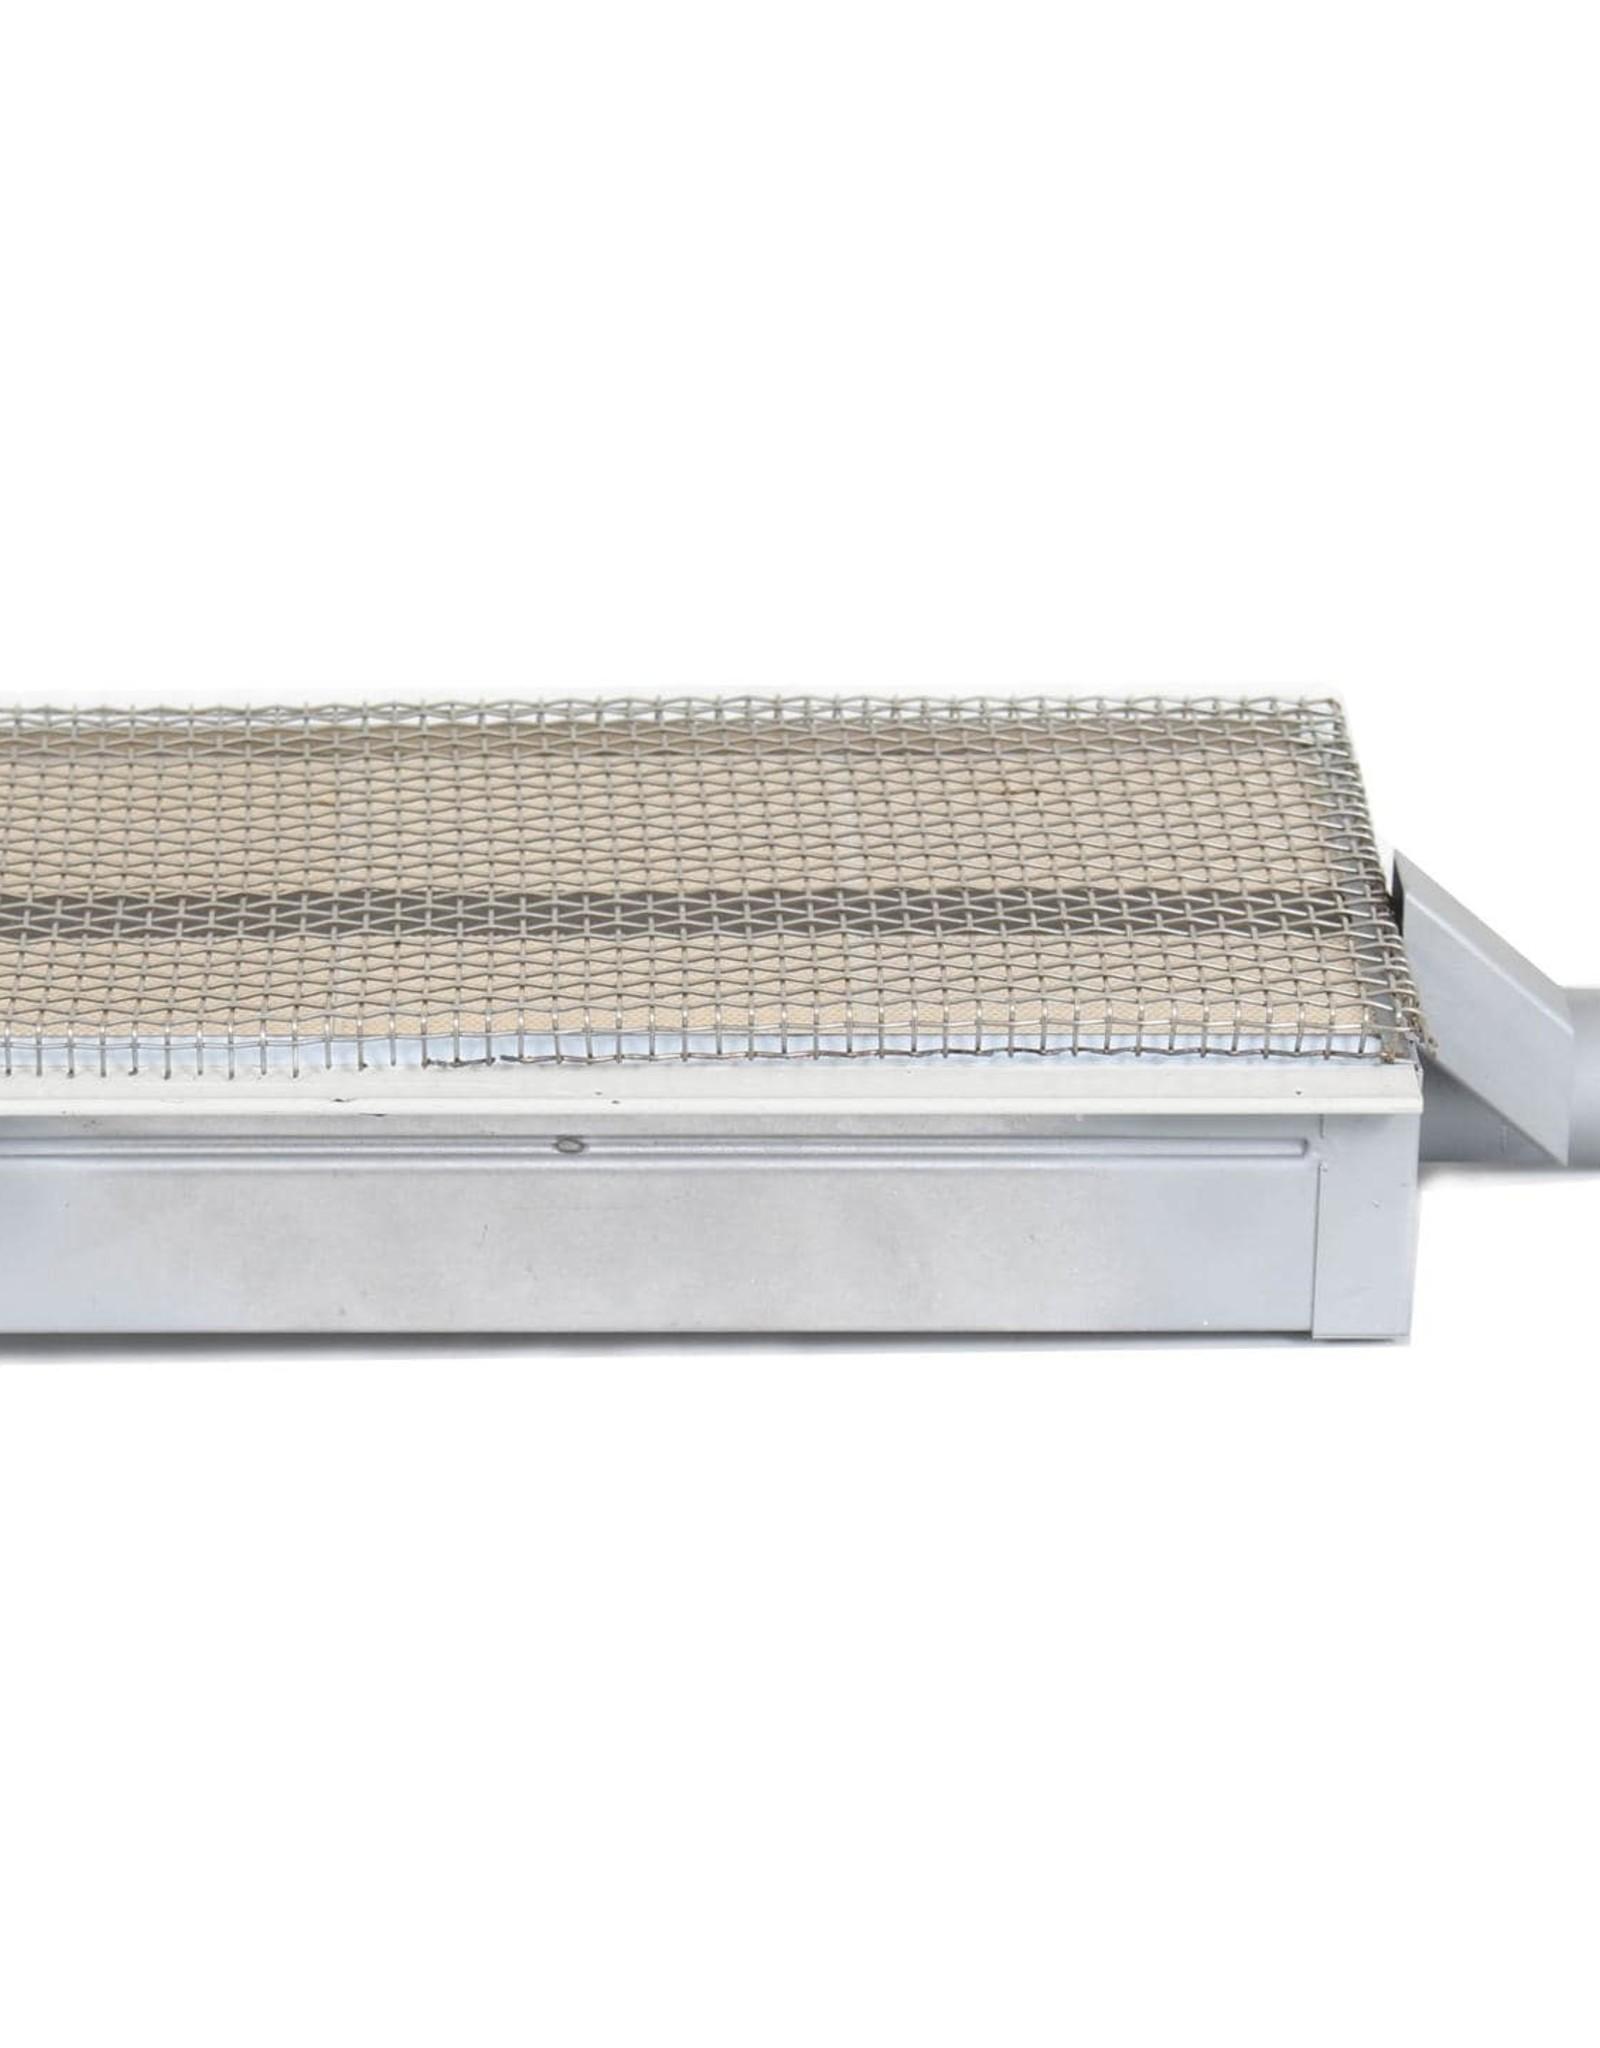 Blaze Outdoor Products Blaze Professional Infrared Searing Burner - BLZ-PRO-IR